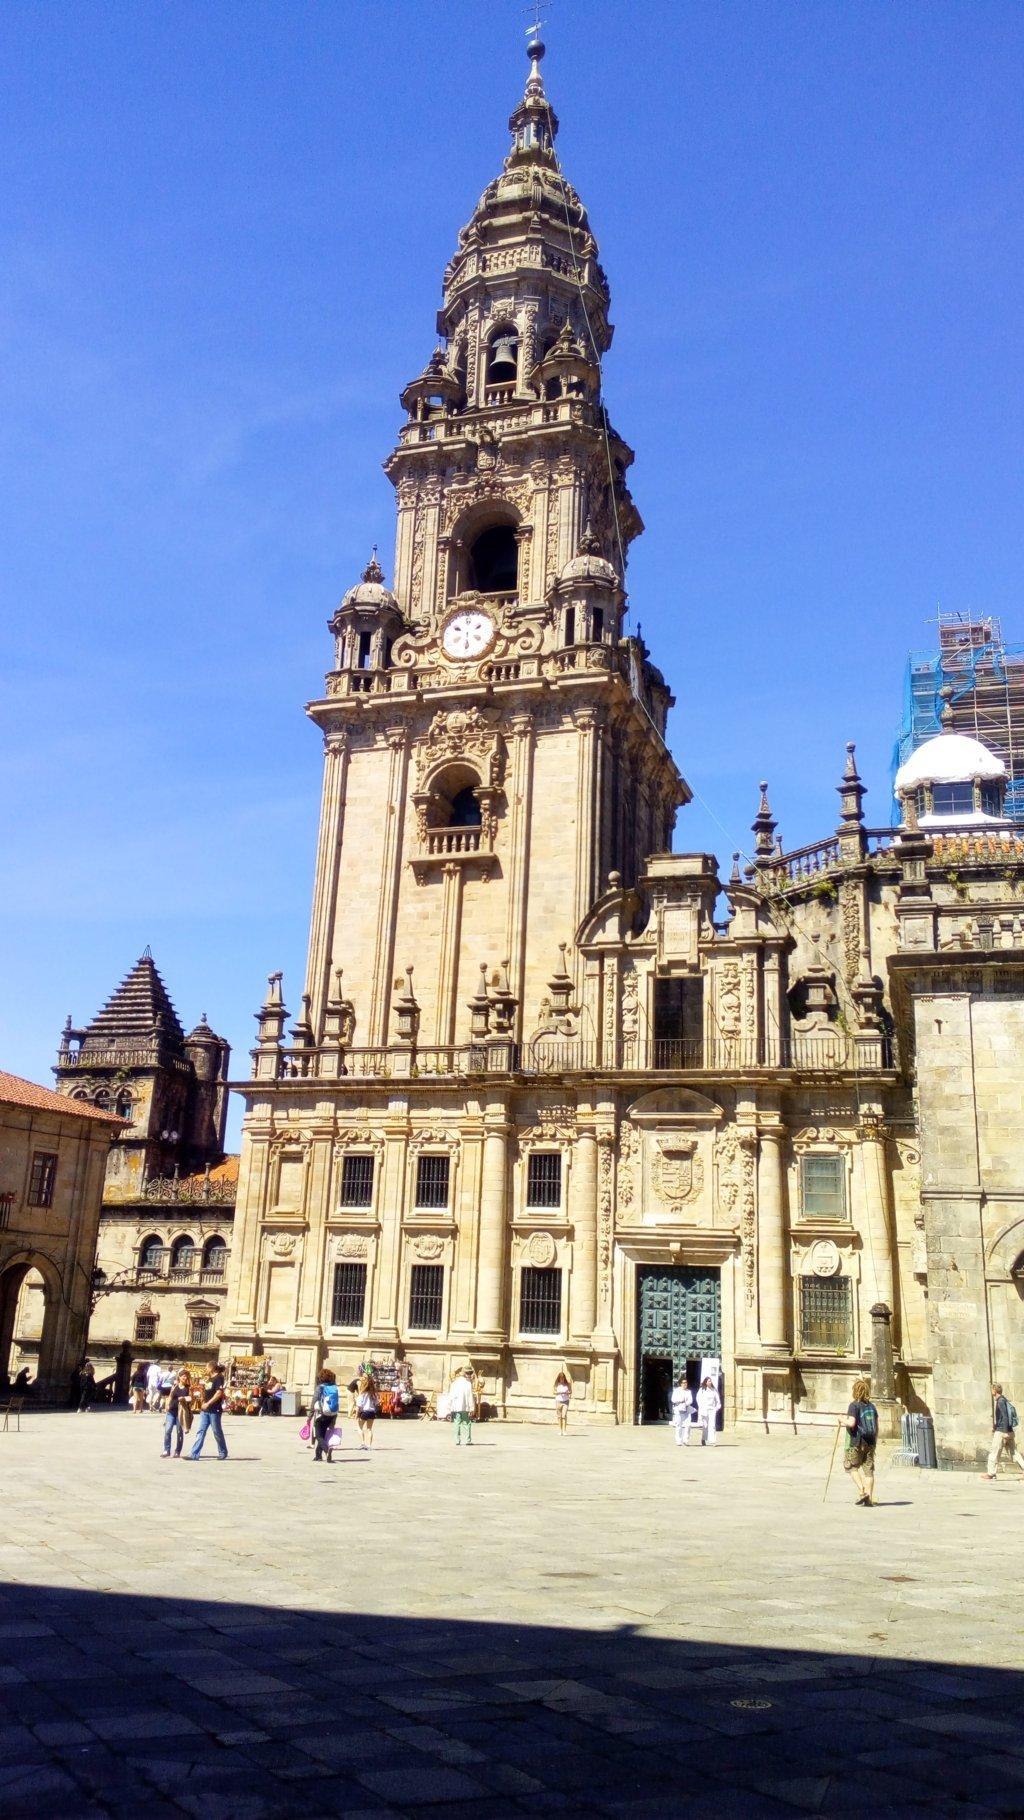 Torre de la Berenguela o del Reloj